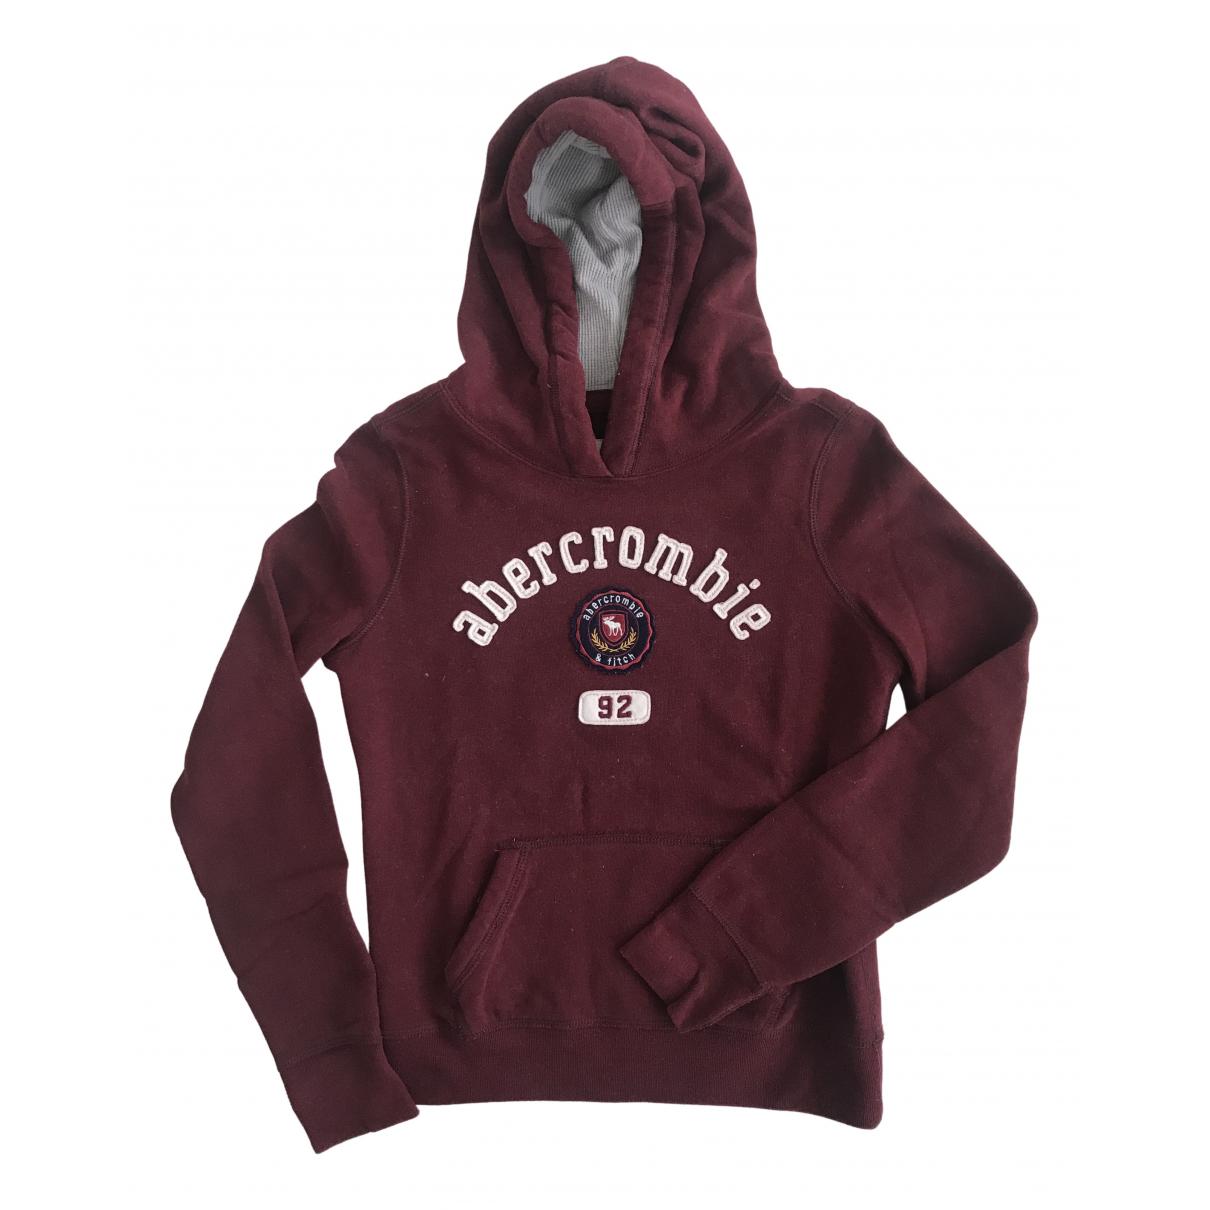 Abercrombie & Fitch \N Cotton Knitwear for Women XS International